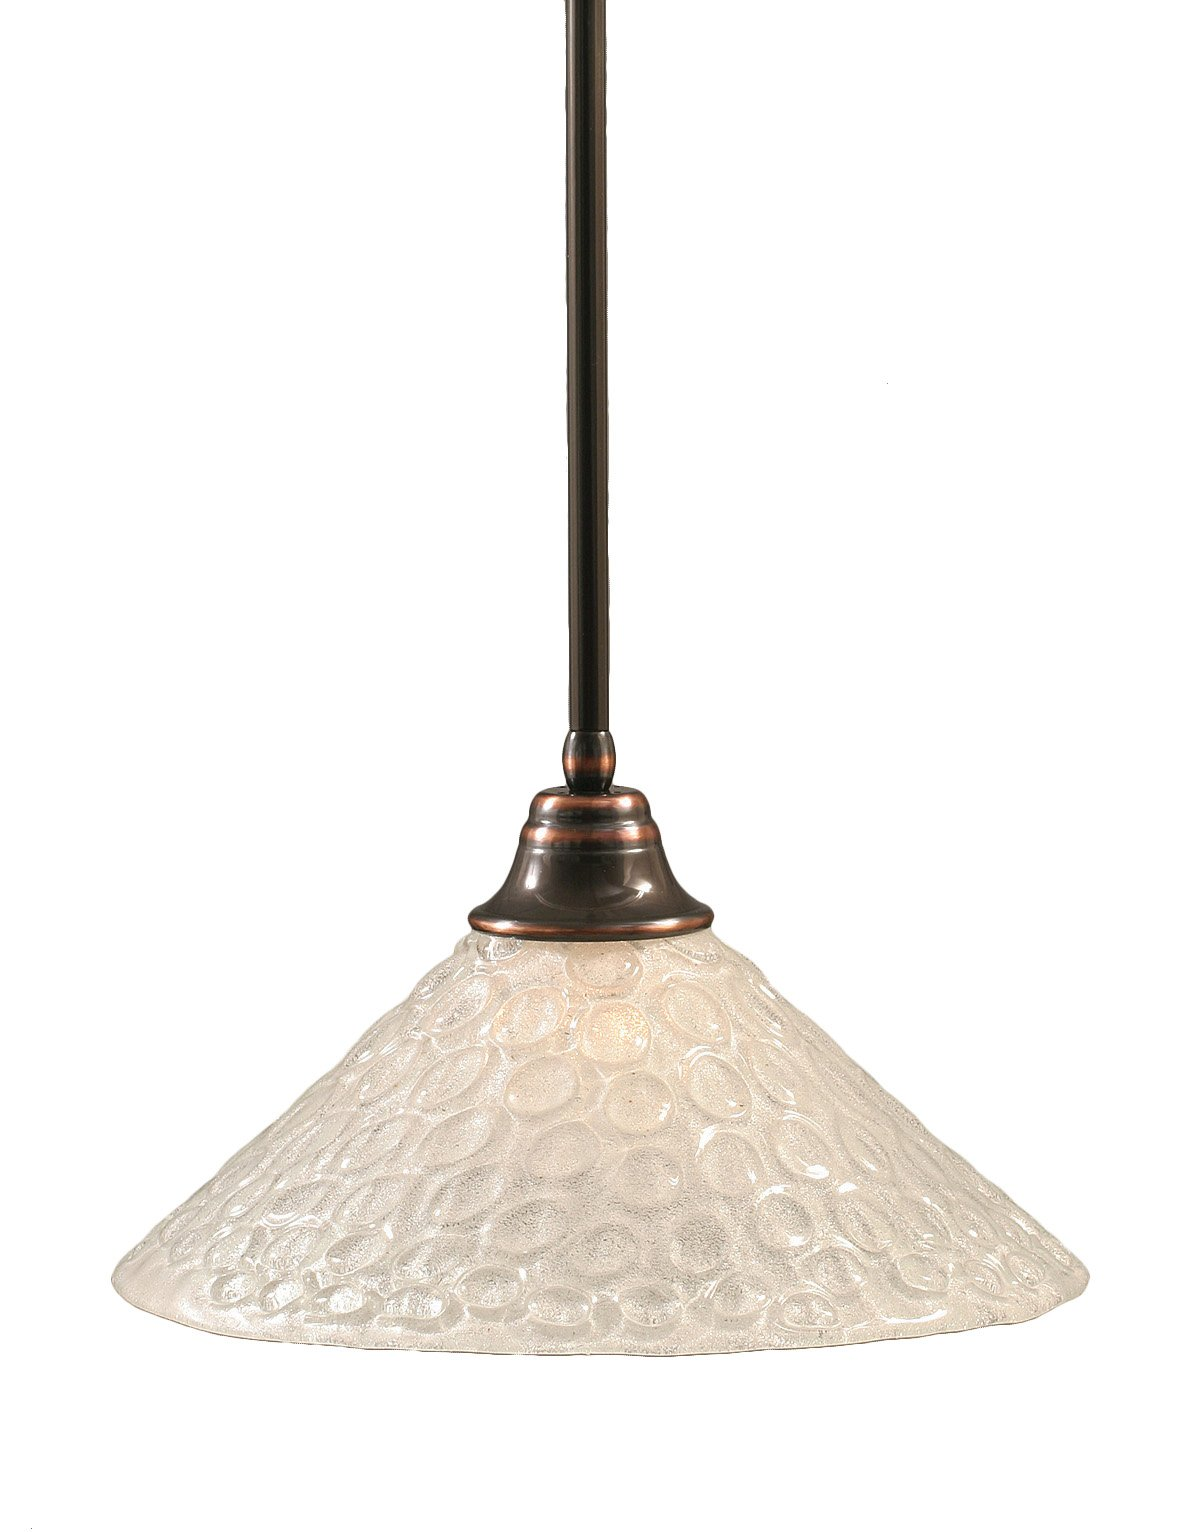 Toltec Lighting 26-BC-411 Stem Pendant Light Black Copper Finish with Italian Bubble Glass Shade, 16-Inch